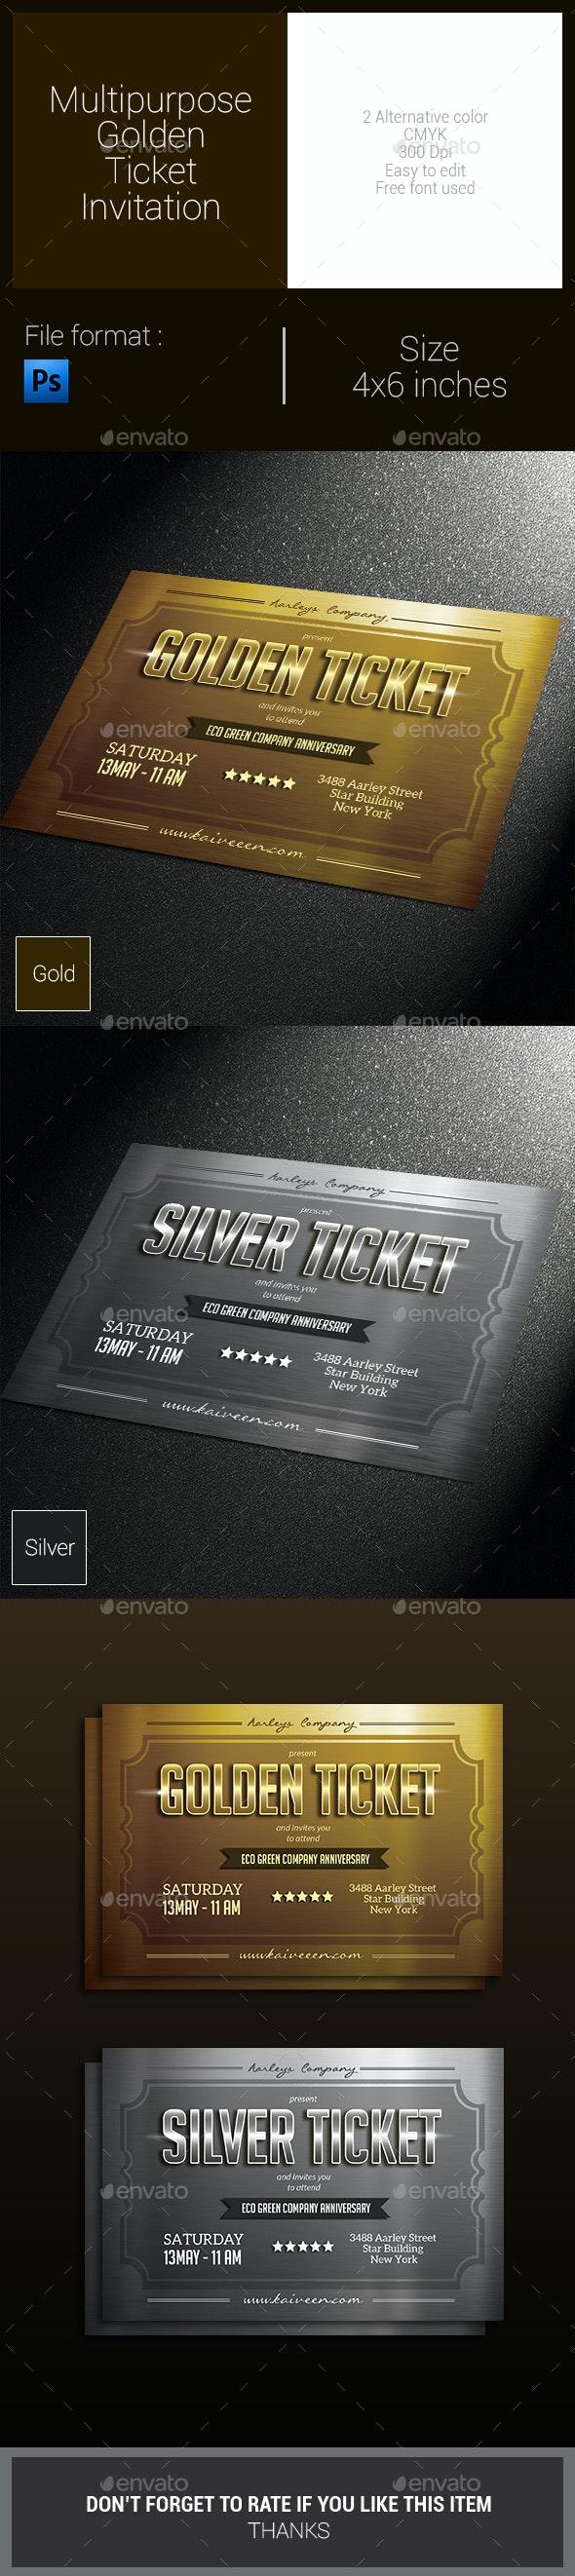 Multipurpose Golden Ticket Invitation - Invitations Cards & Invites